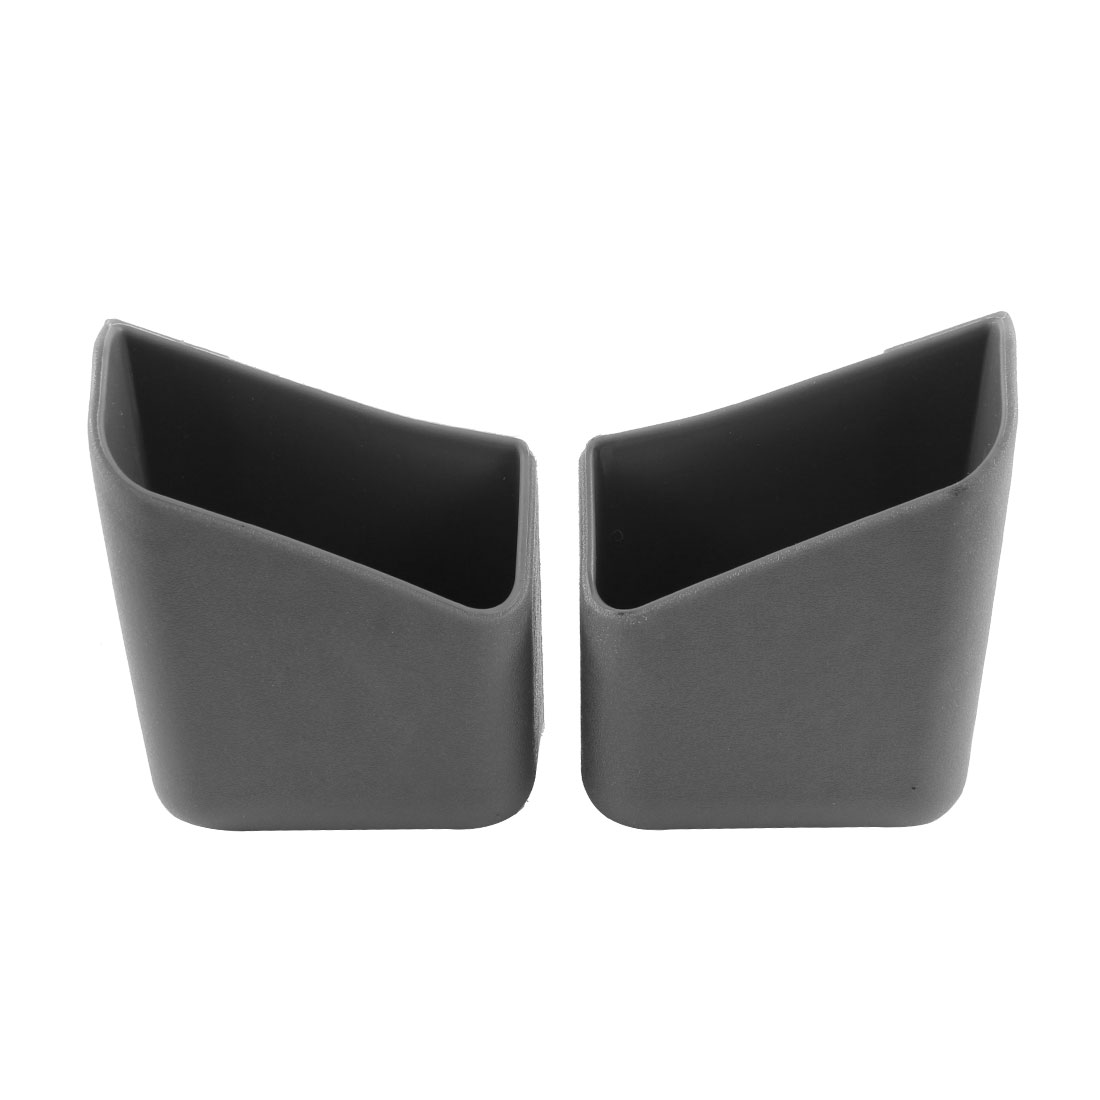 2 Pcs Gray Plastic Car Interior Shelf Adhesive Holder Storage